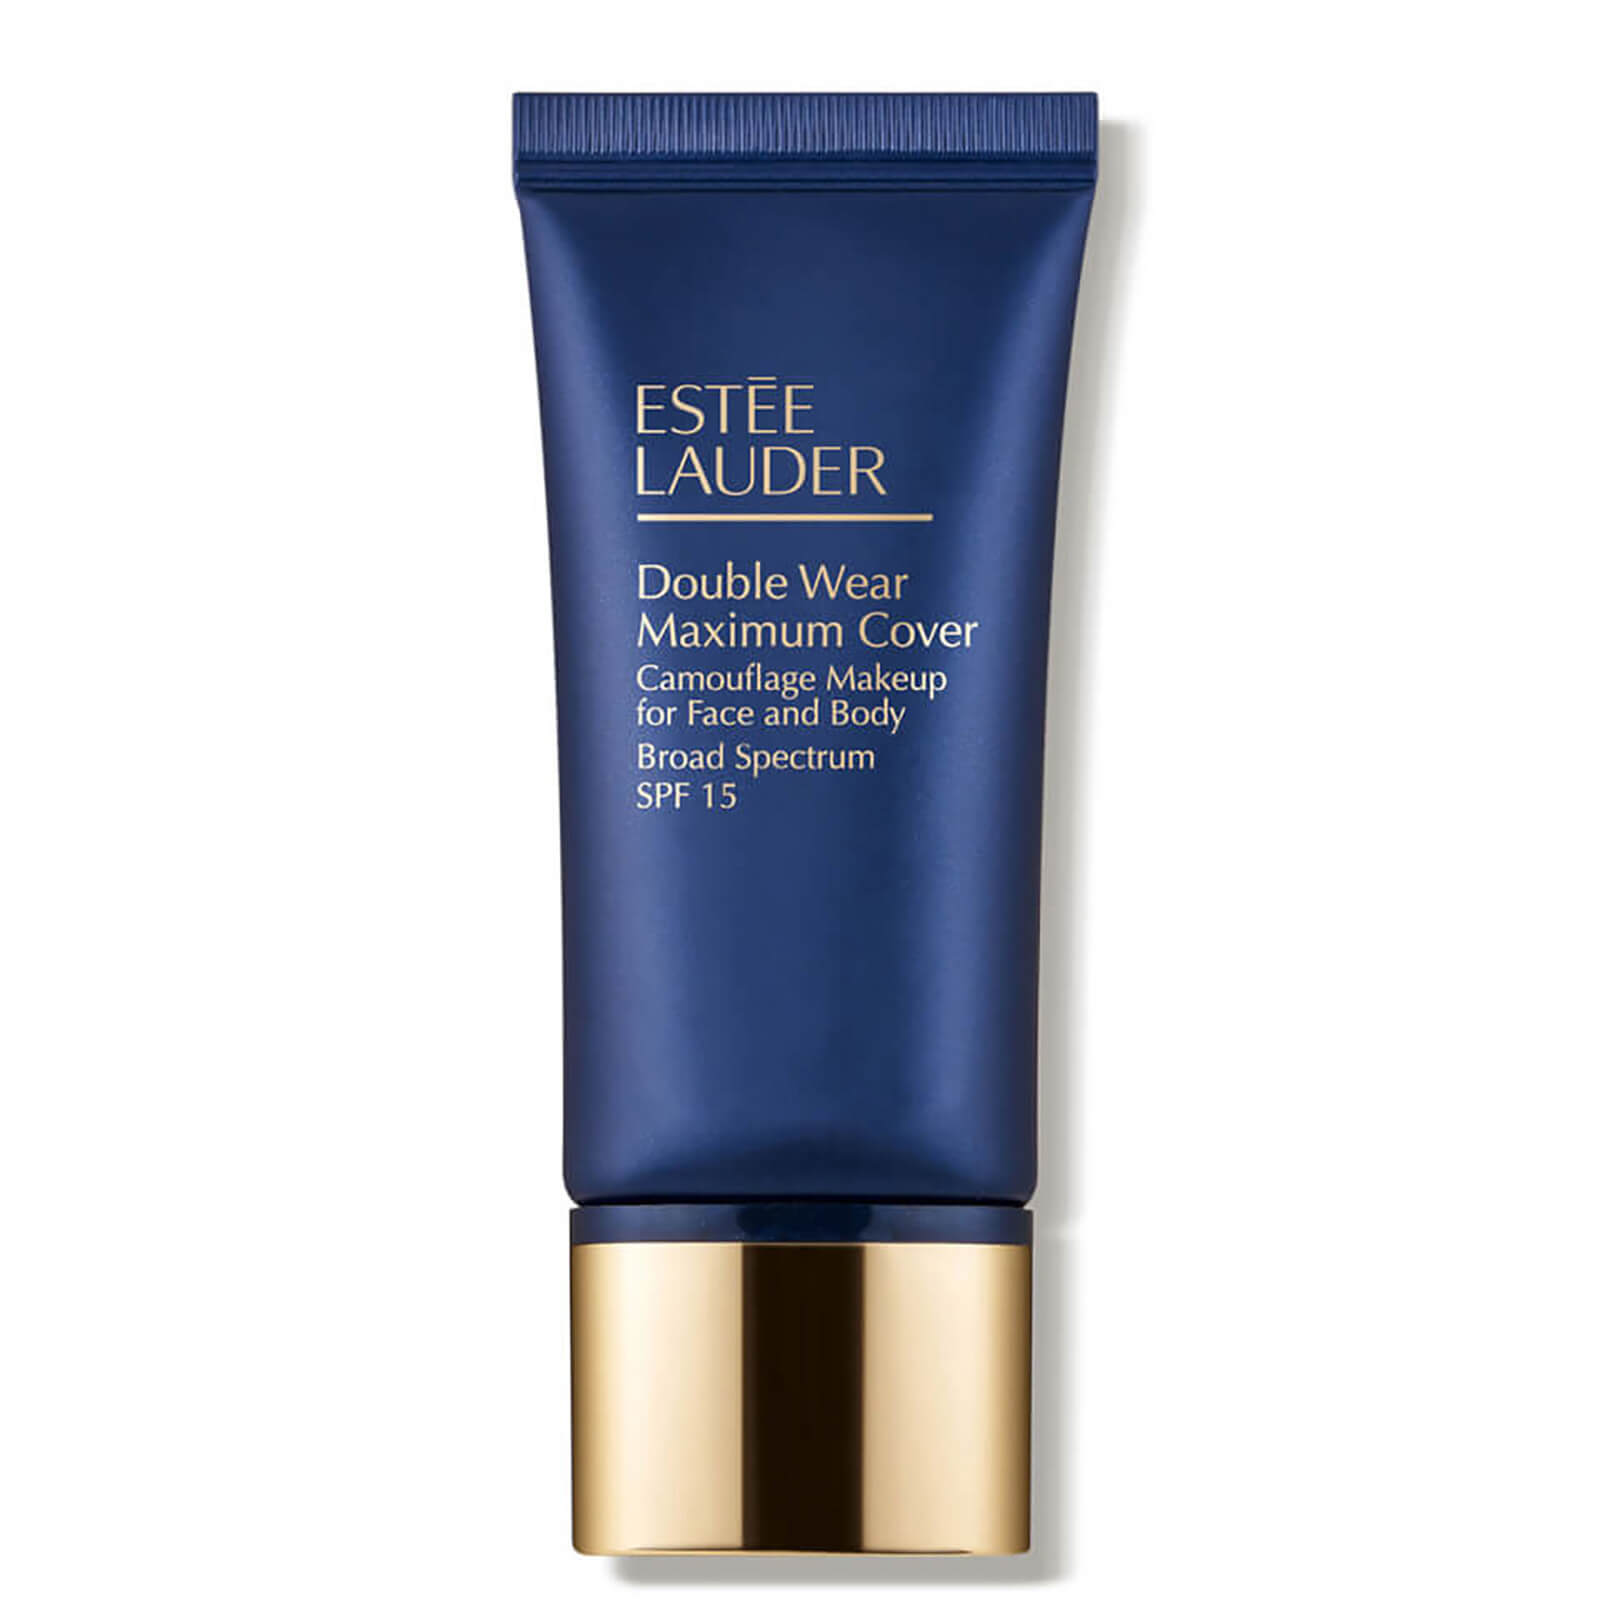 Купить Estée Lauder Double Wear Maximum Cover Camouflage Makeup for Face and Body SPF15 30ml - 1C1 Cool Bone